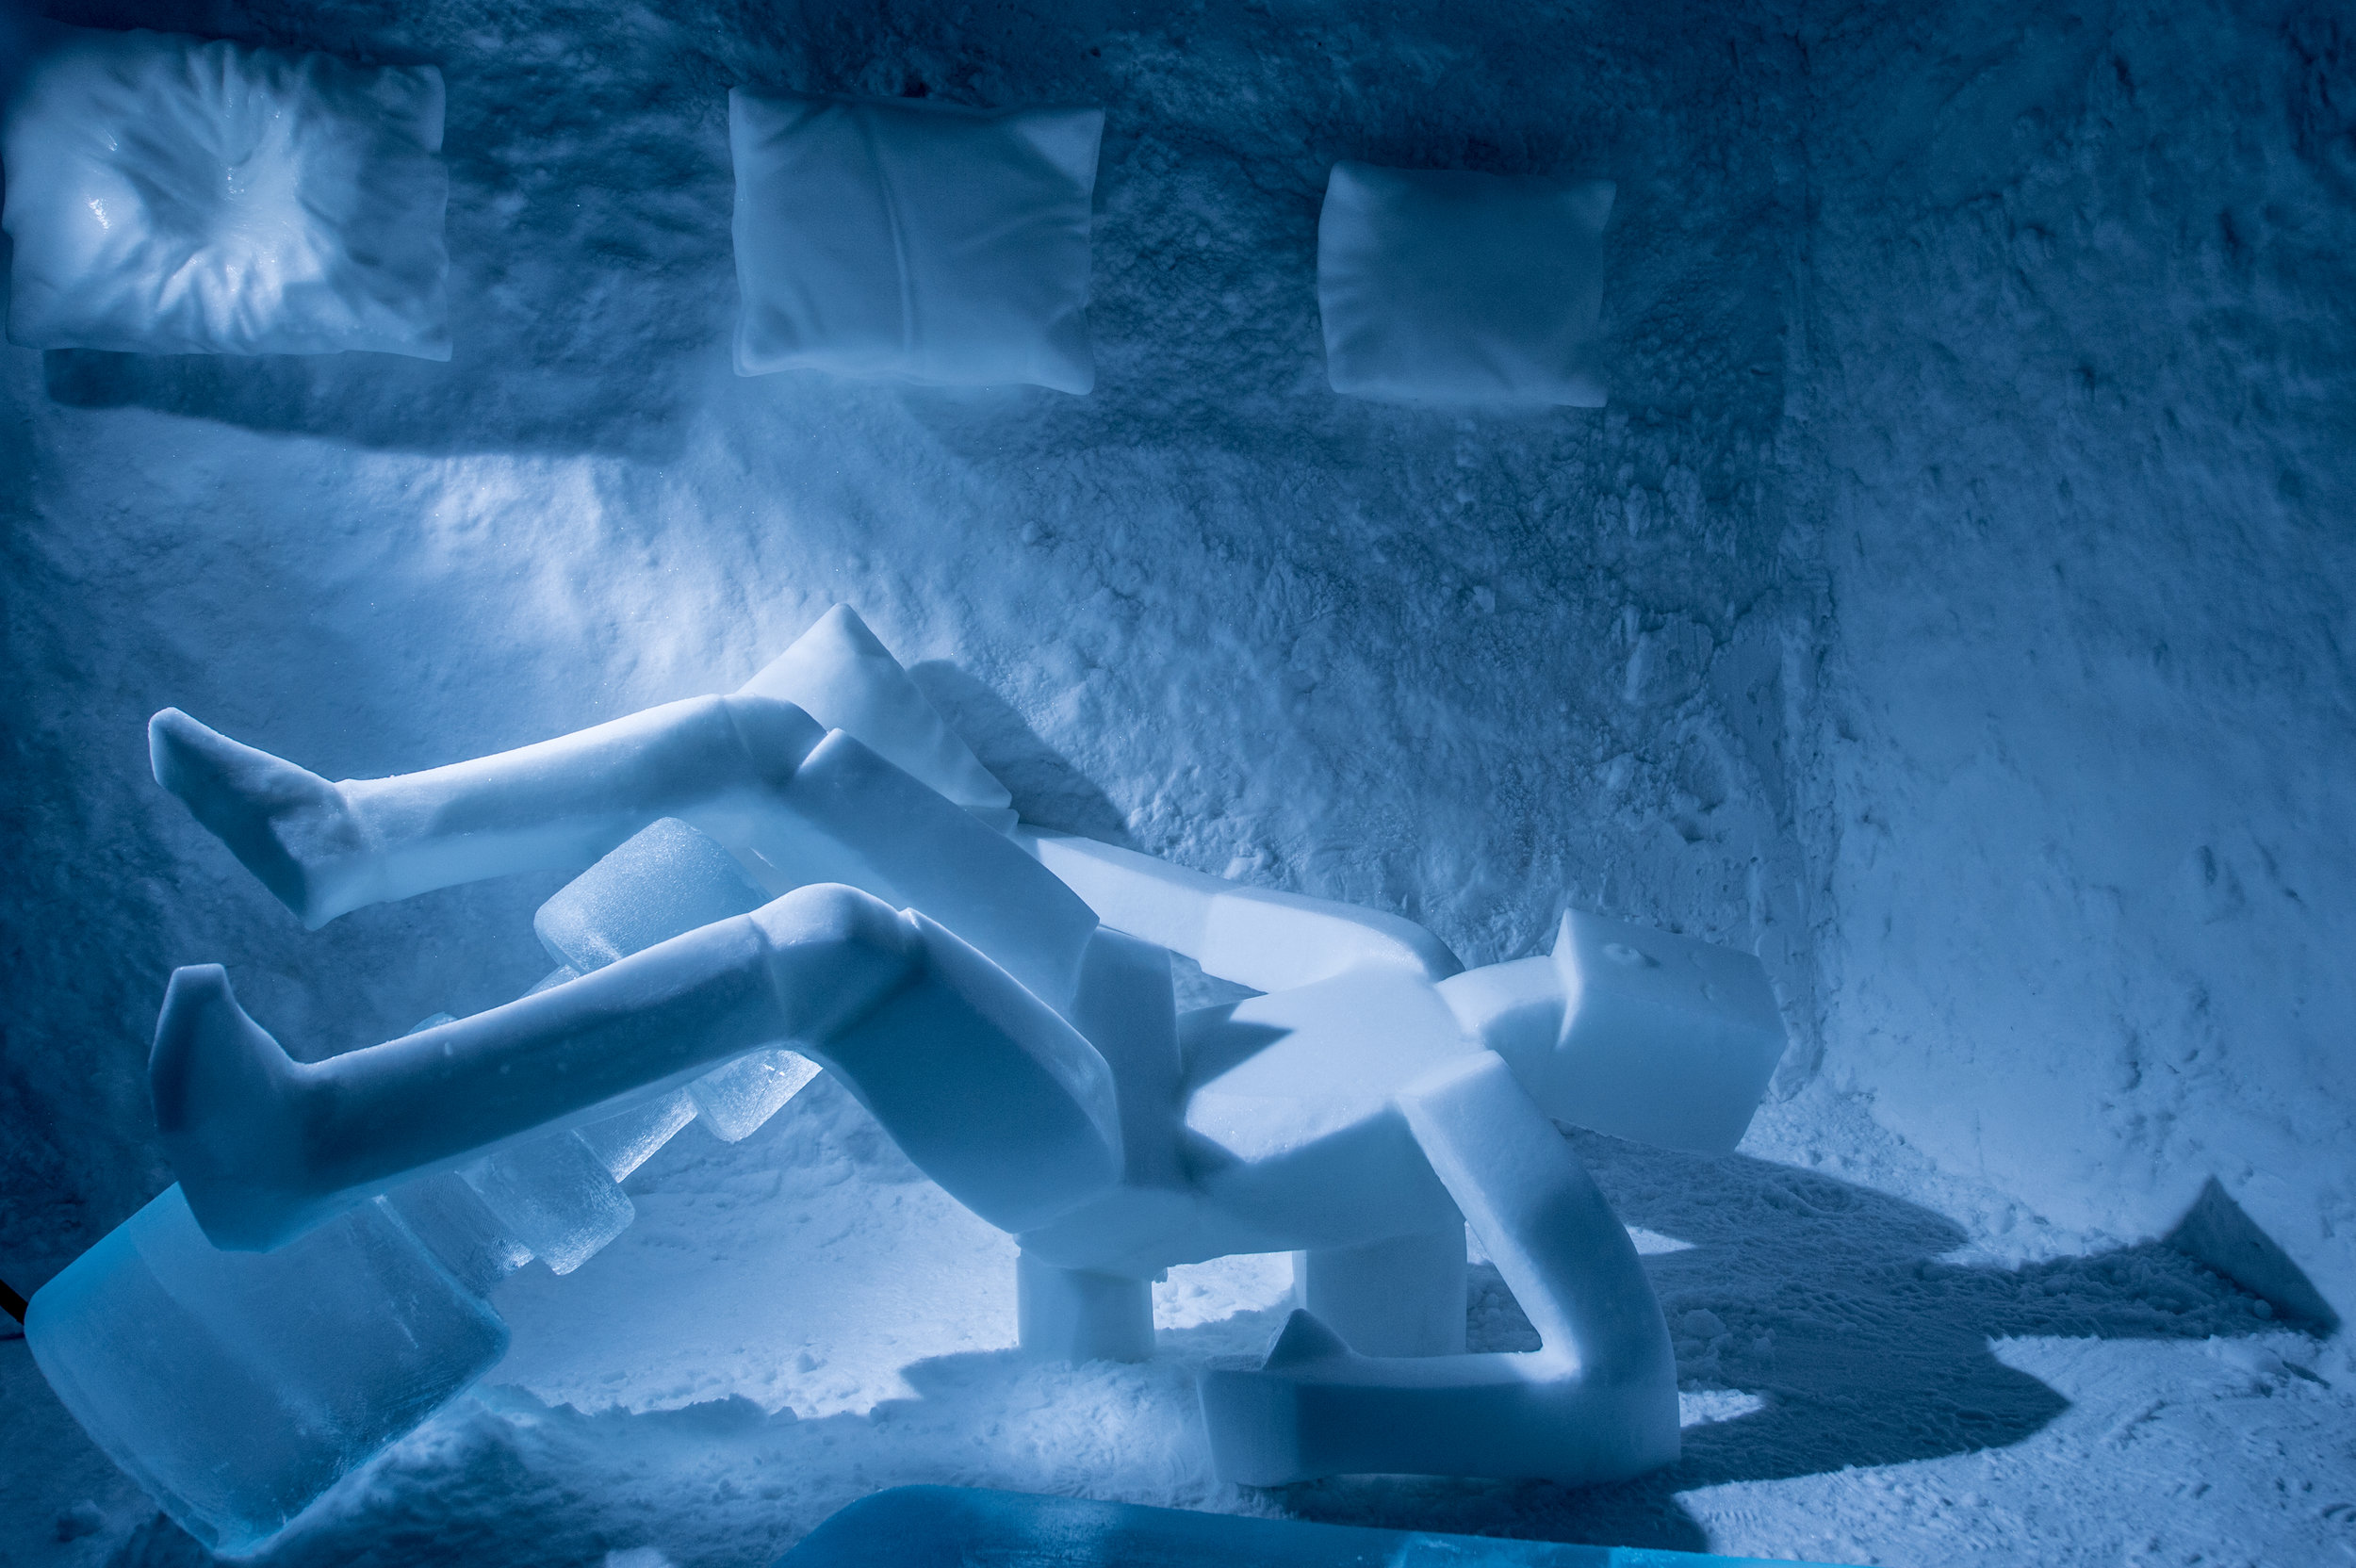 Edith Van de Wetering & Wilfred Stijger Pillow bar----ICEHOTEL 365 photo by - Asaf Kliger (3 of 4) (3 of 3).jpg